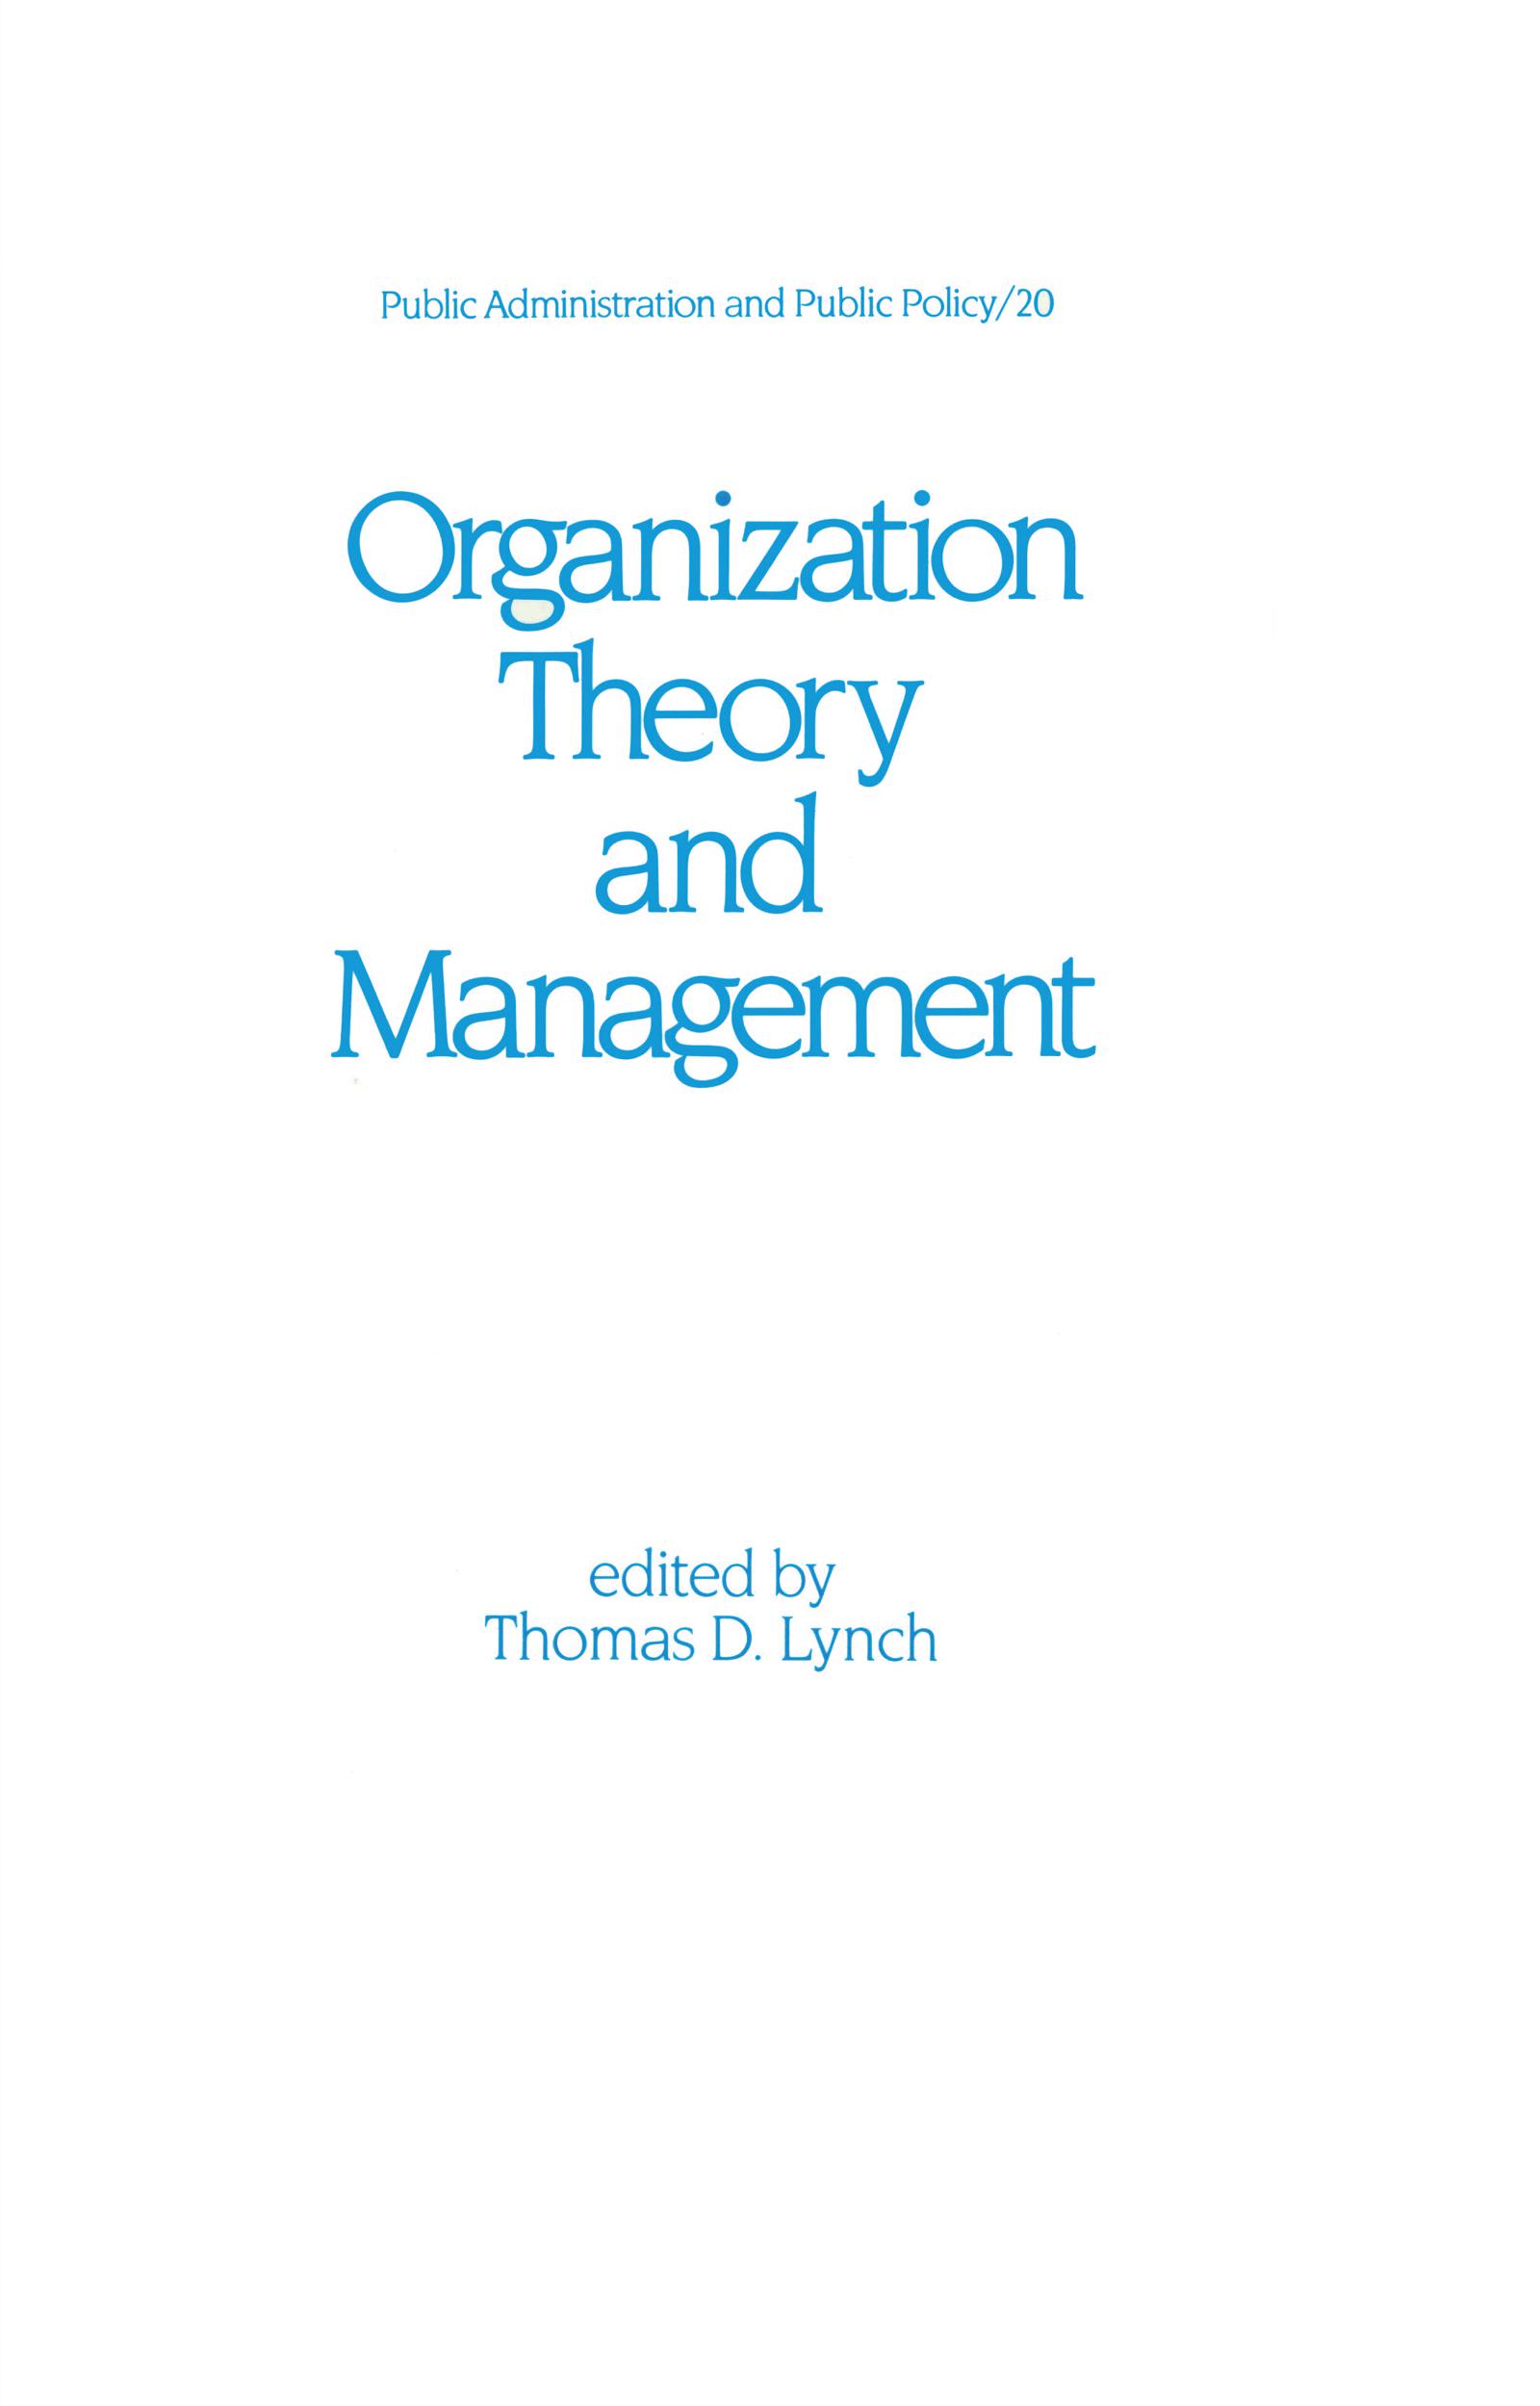 Organization Theory and Management